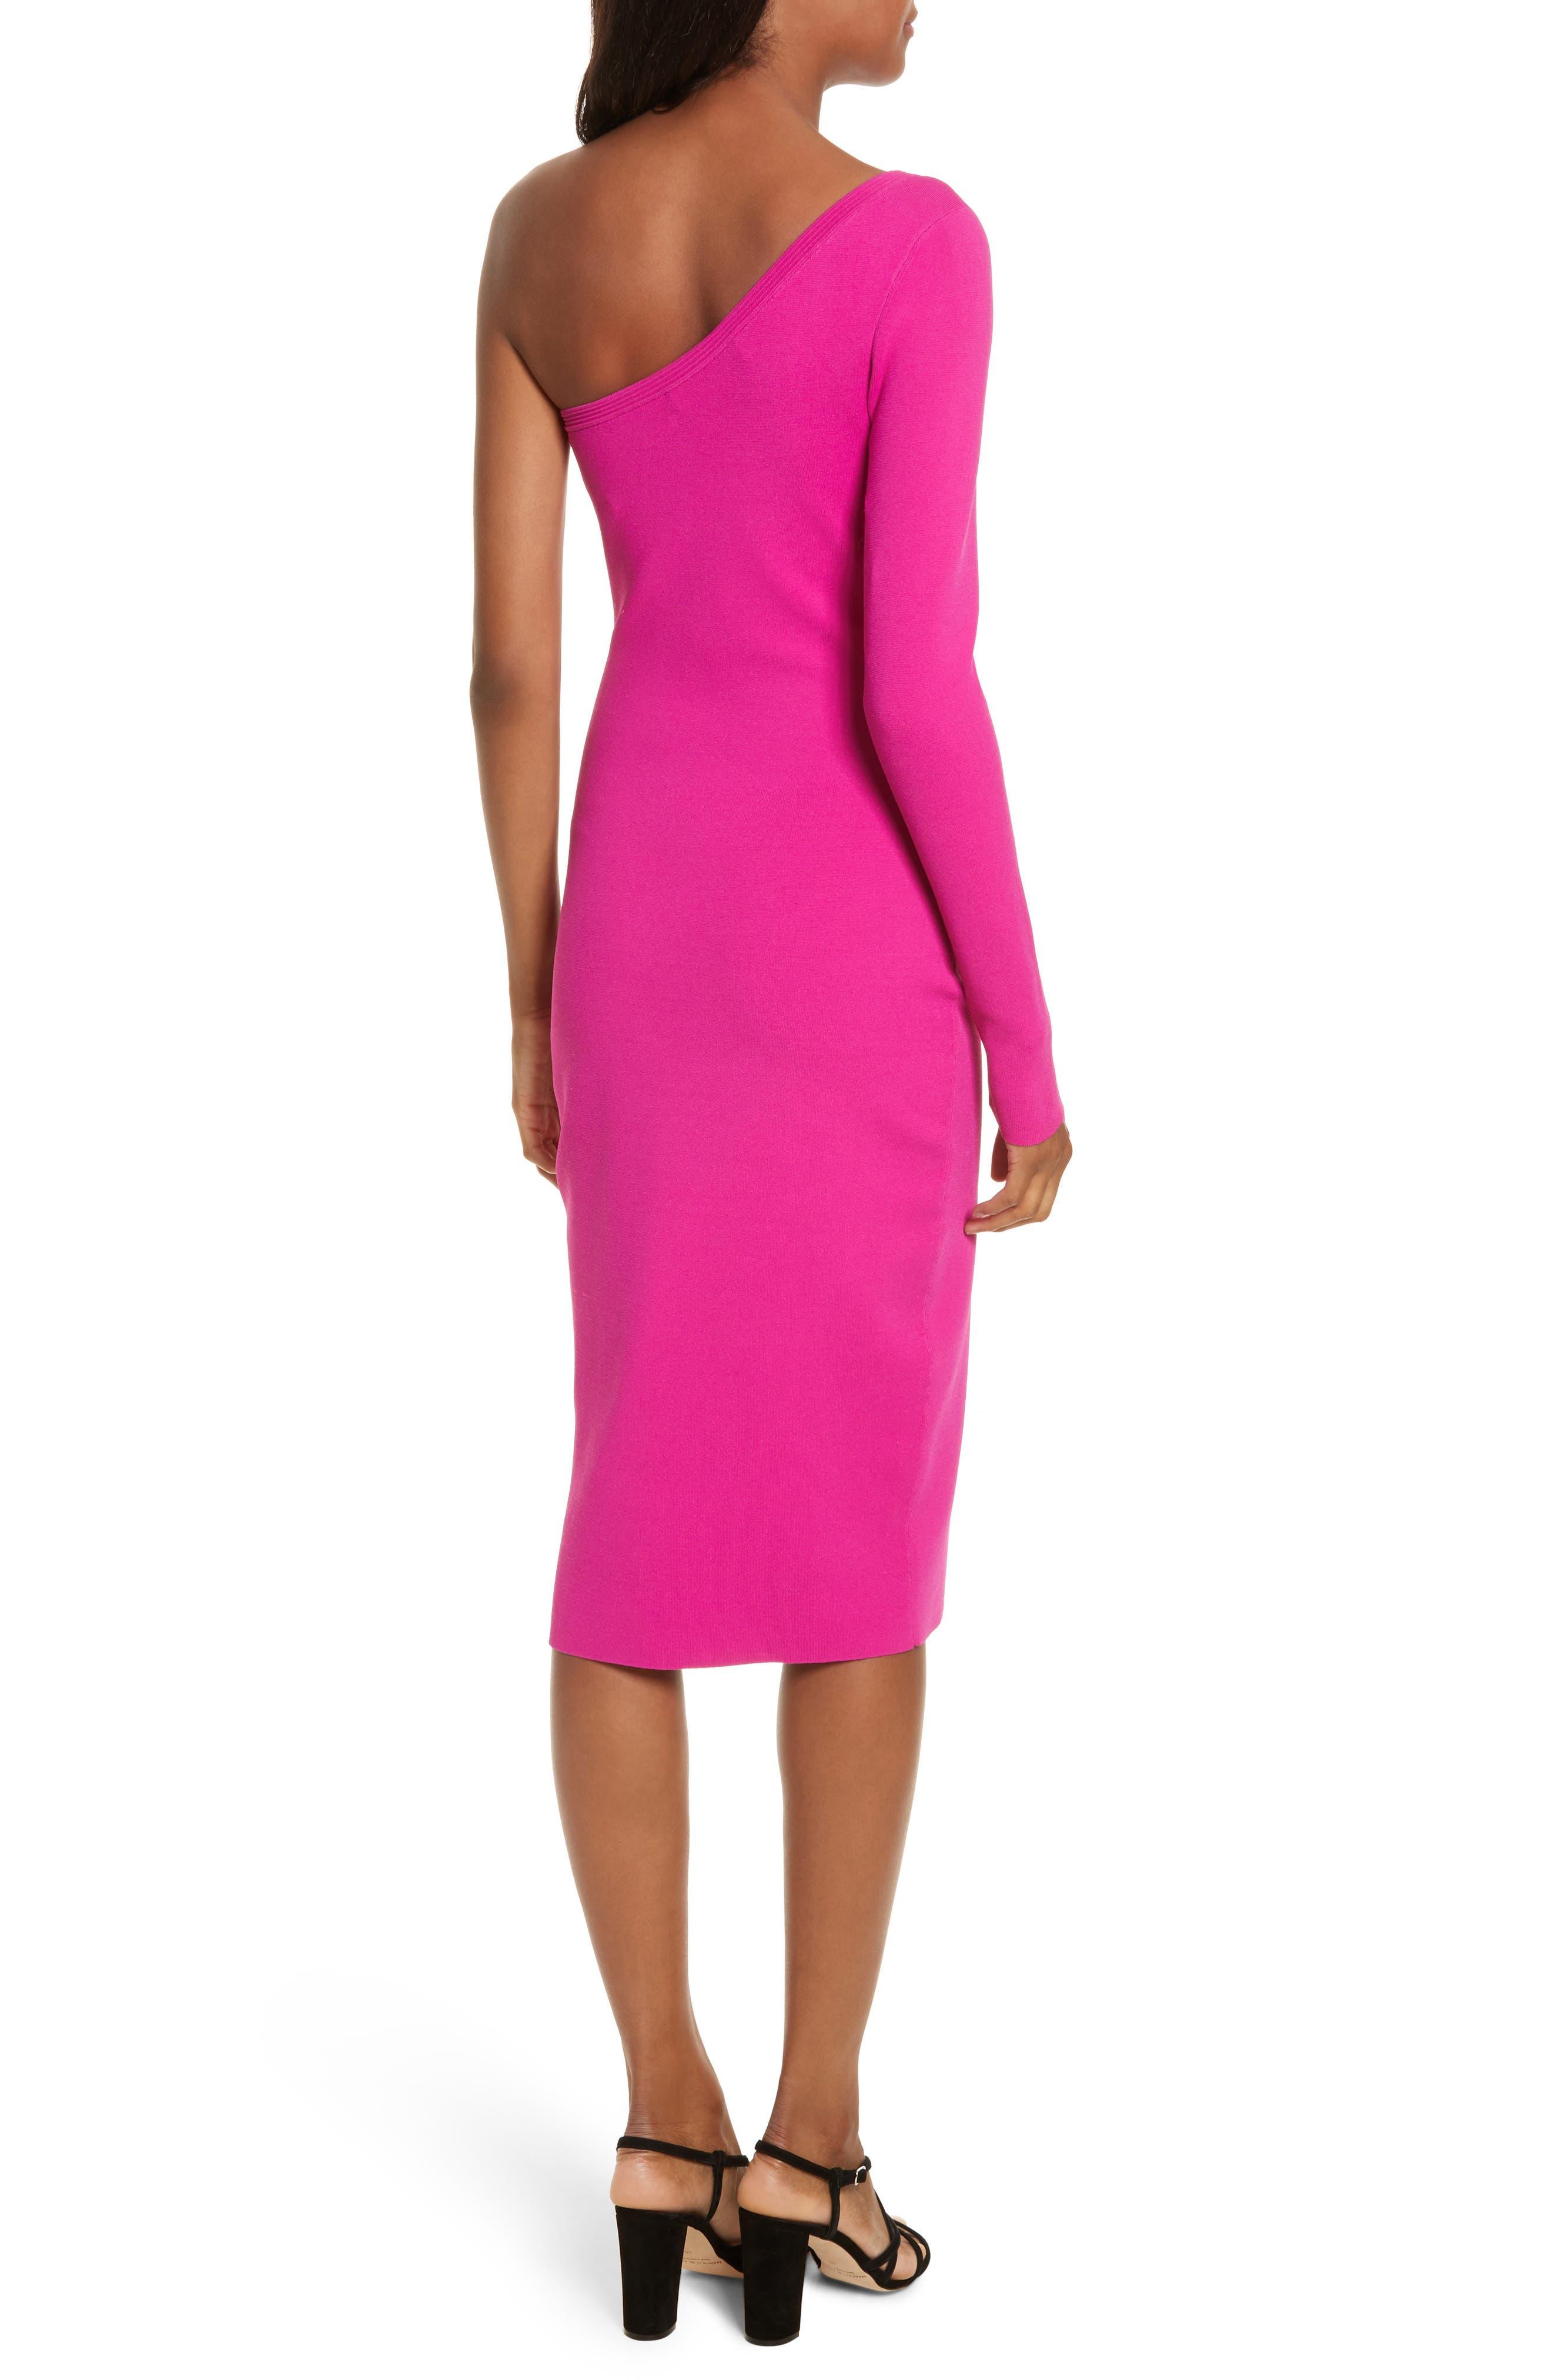 Diane von Furstenberg Knit One-Shoulder Midi Dress,                             Alternate thumbnail 2, color,                             Ribbon Pink